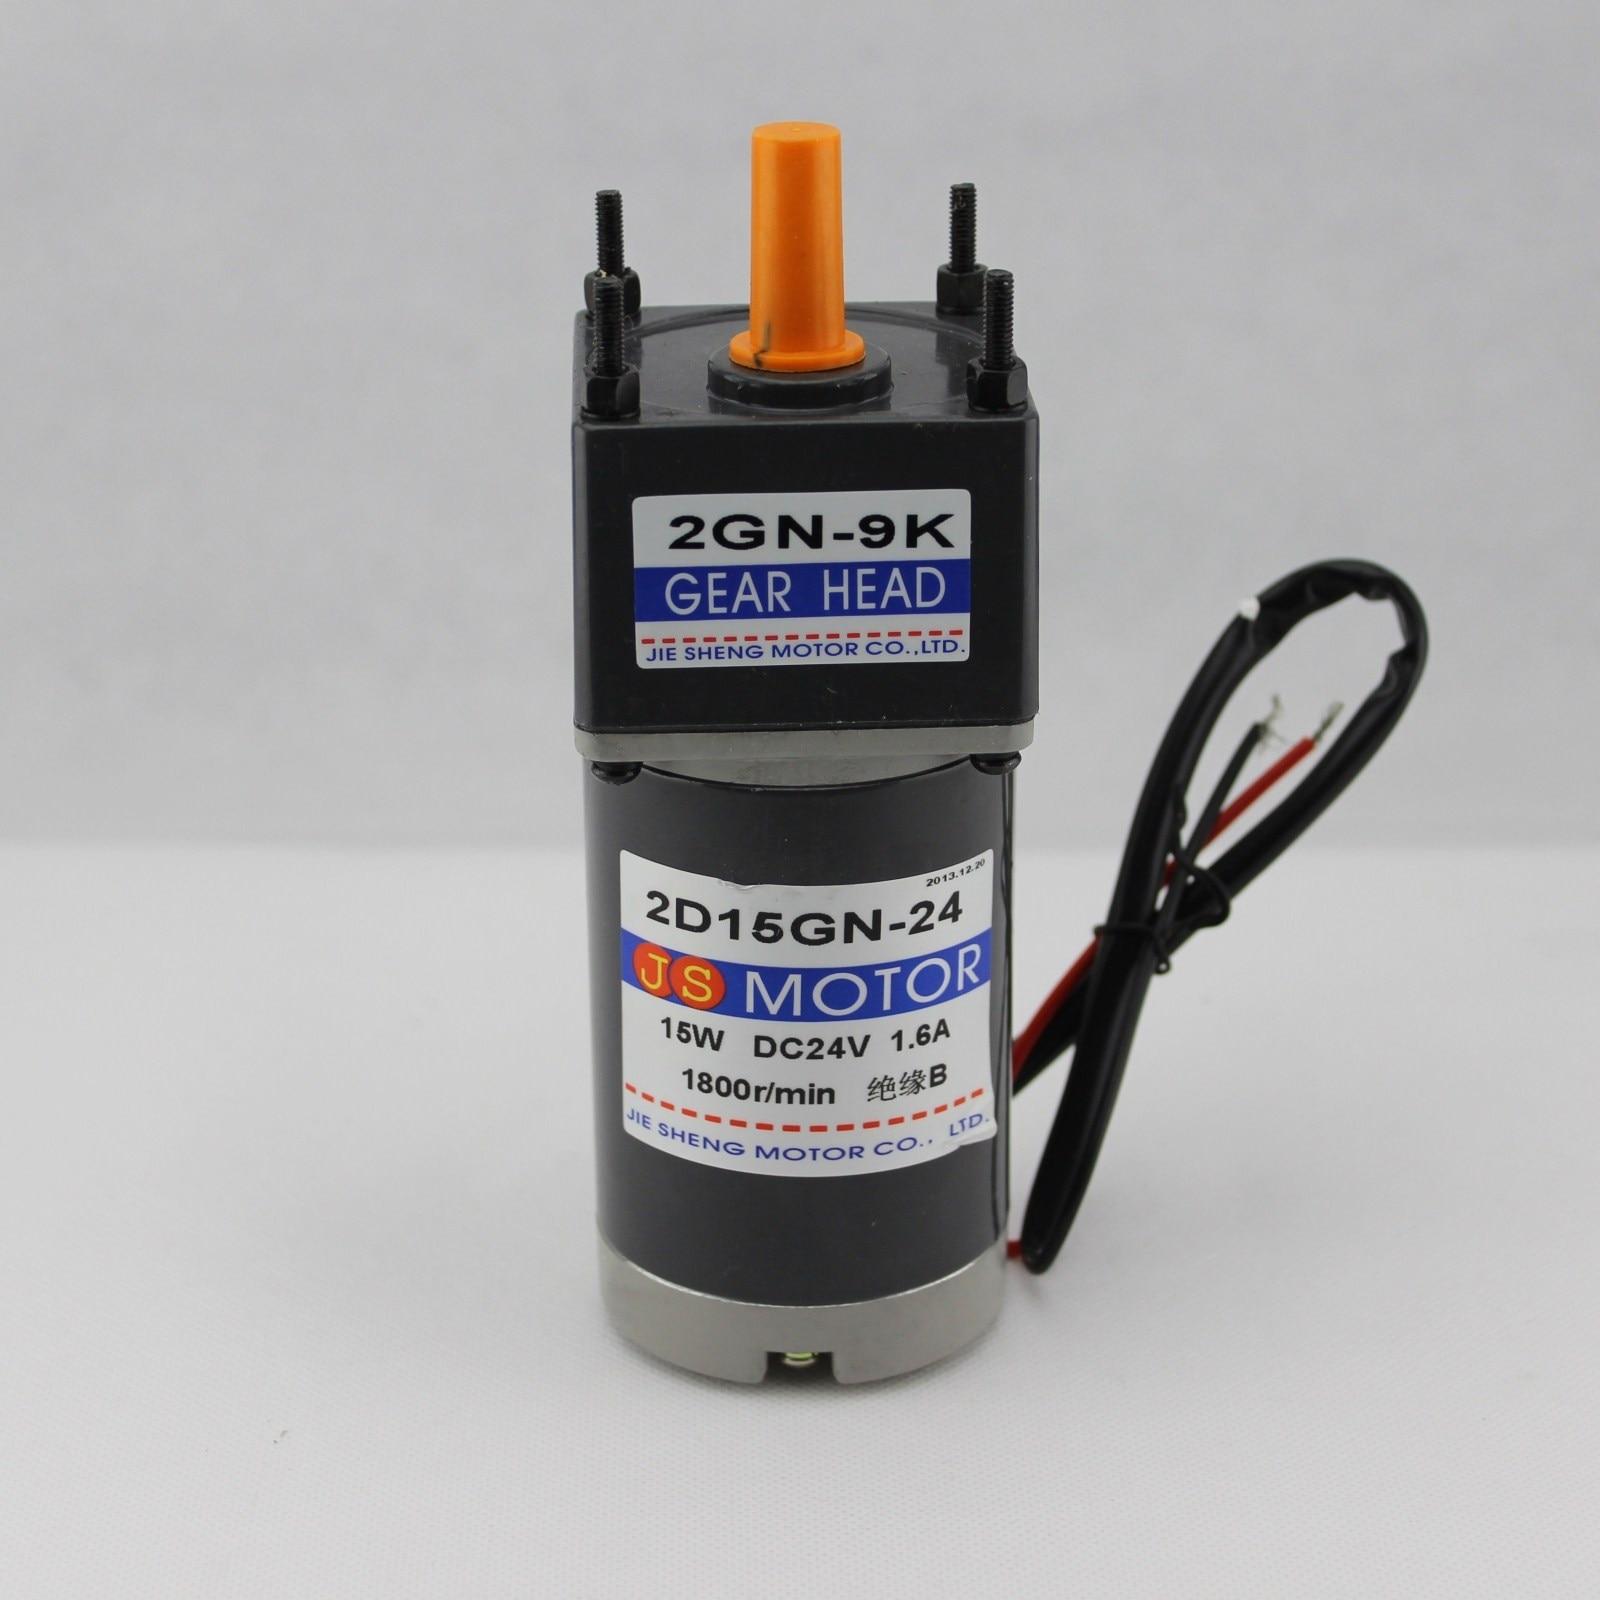 15w dc gear motor gear motor energetically dc24v gear motor  2D15GN-24  15w dc gear motor gear motor energetically dc24v gear motor  2D15GN-24